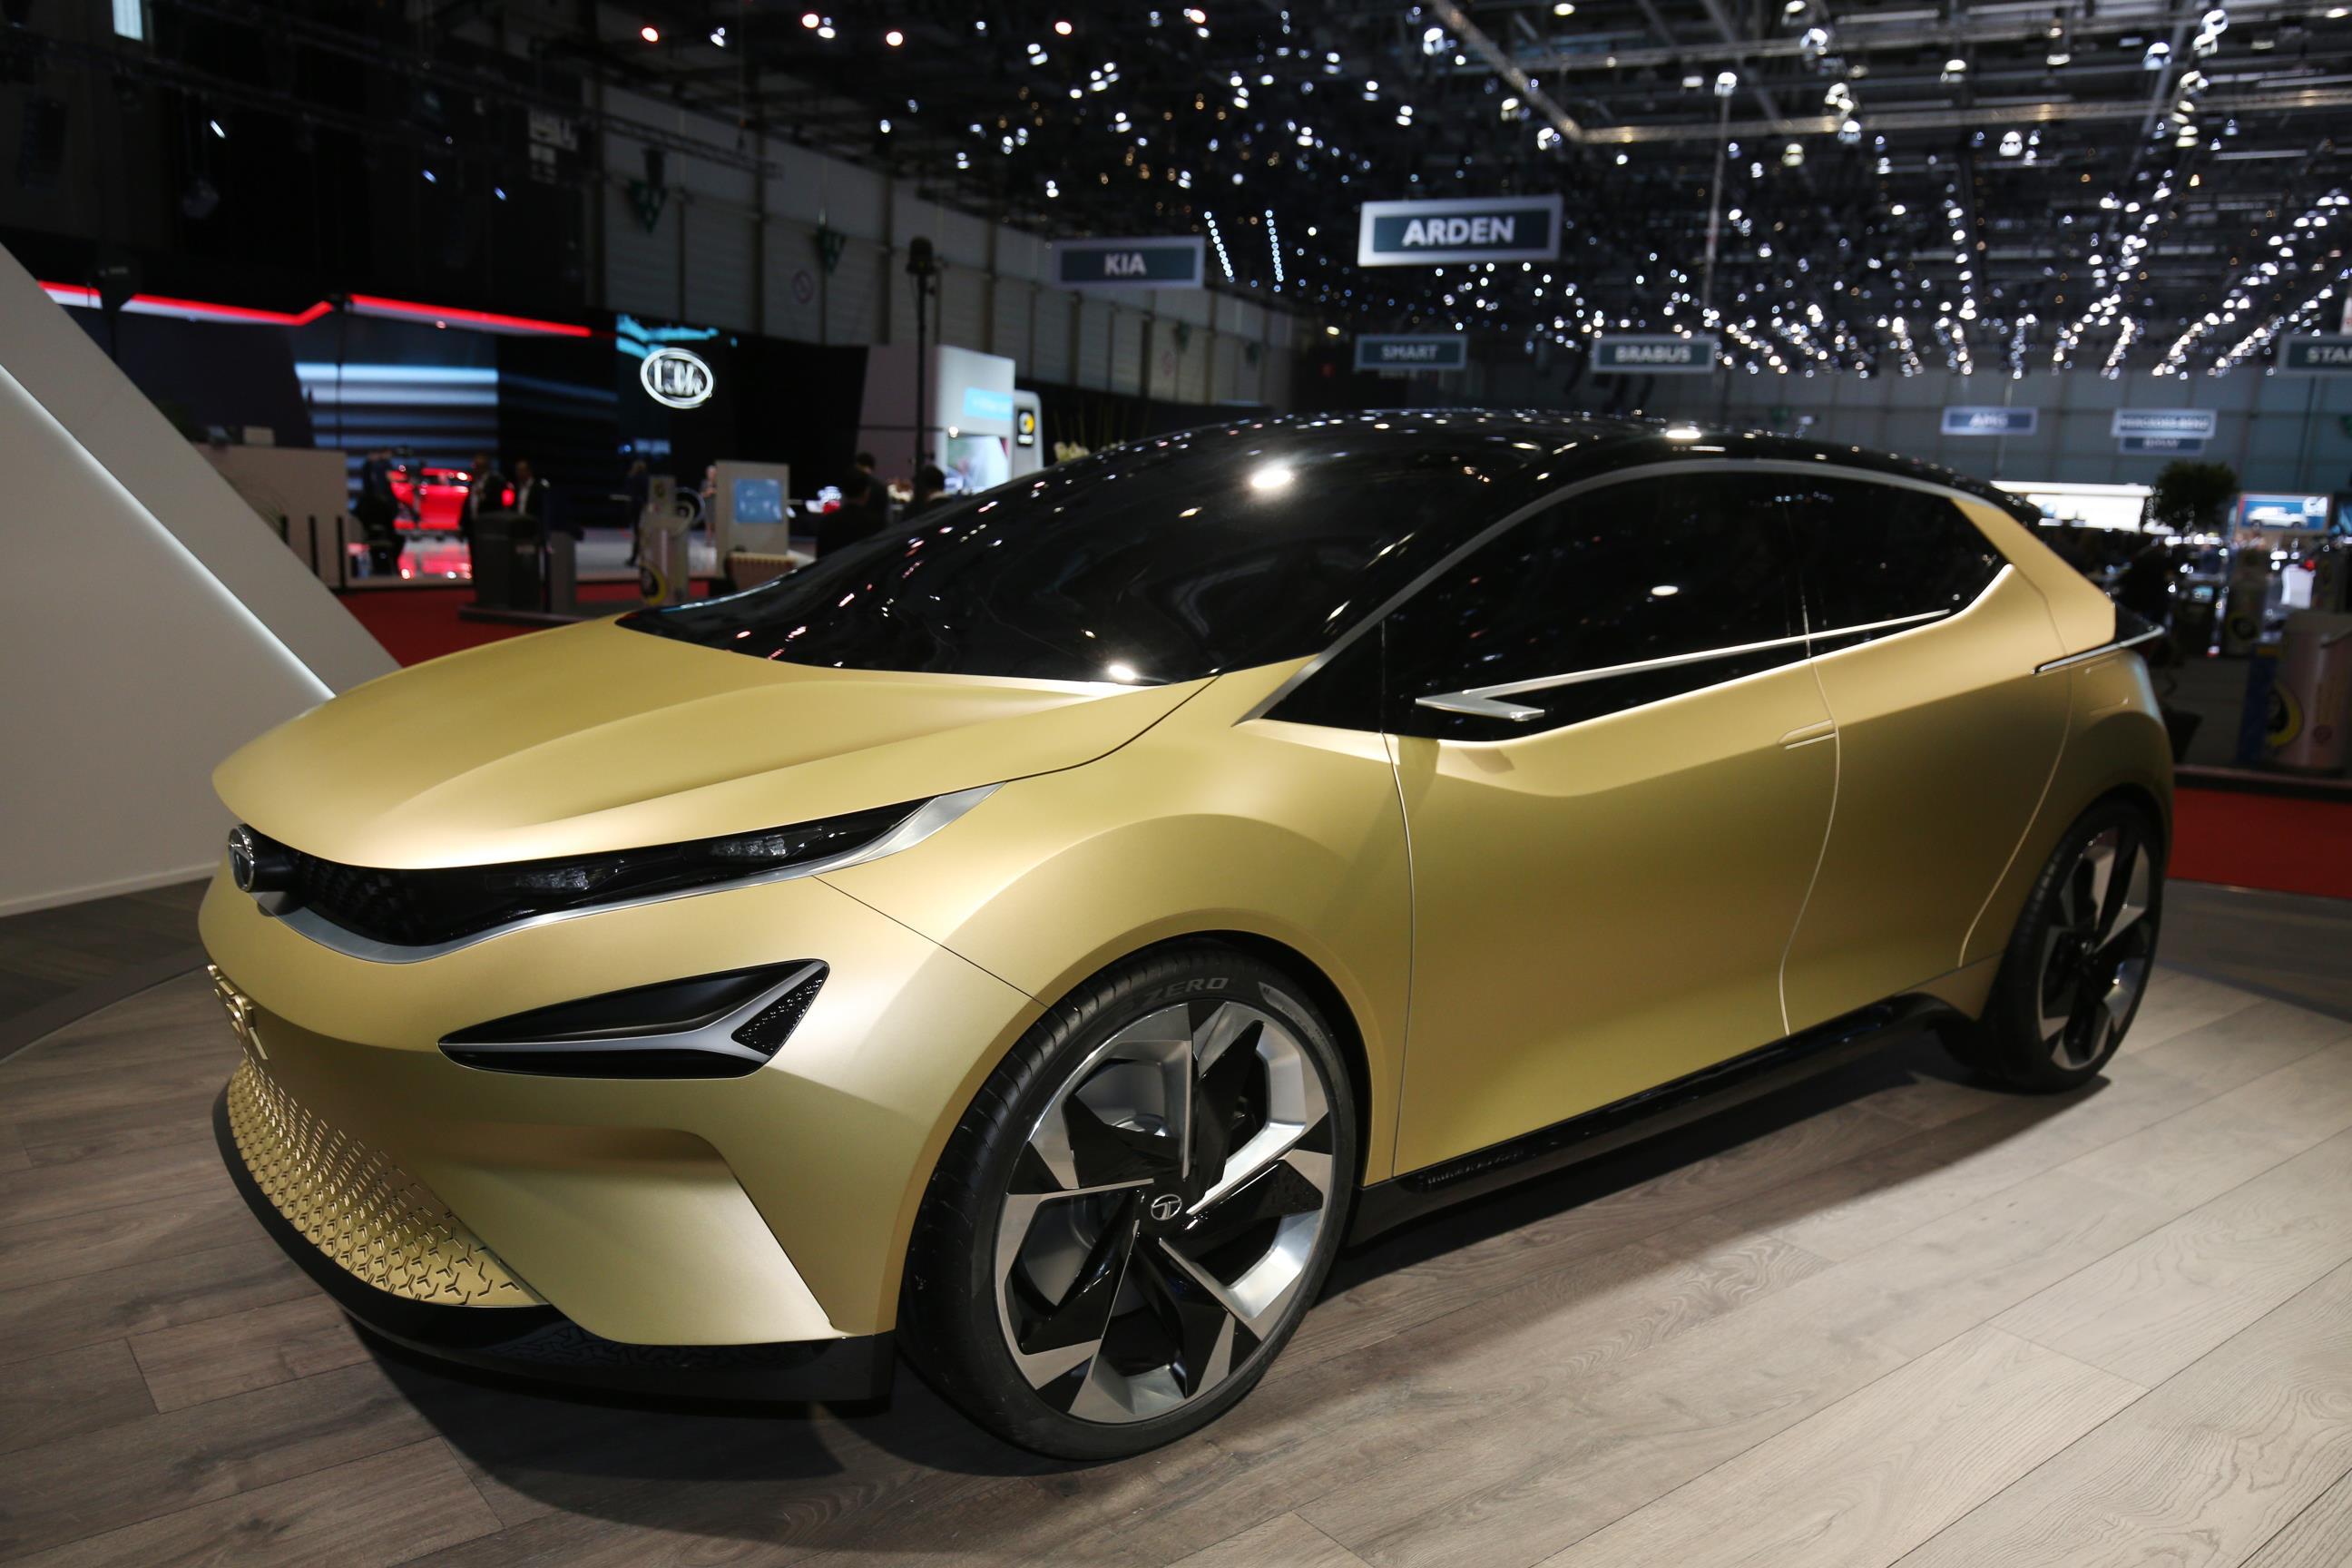 Geneva Motor Show 2018 Mega Gallery Part 2 (181)